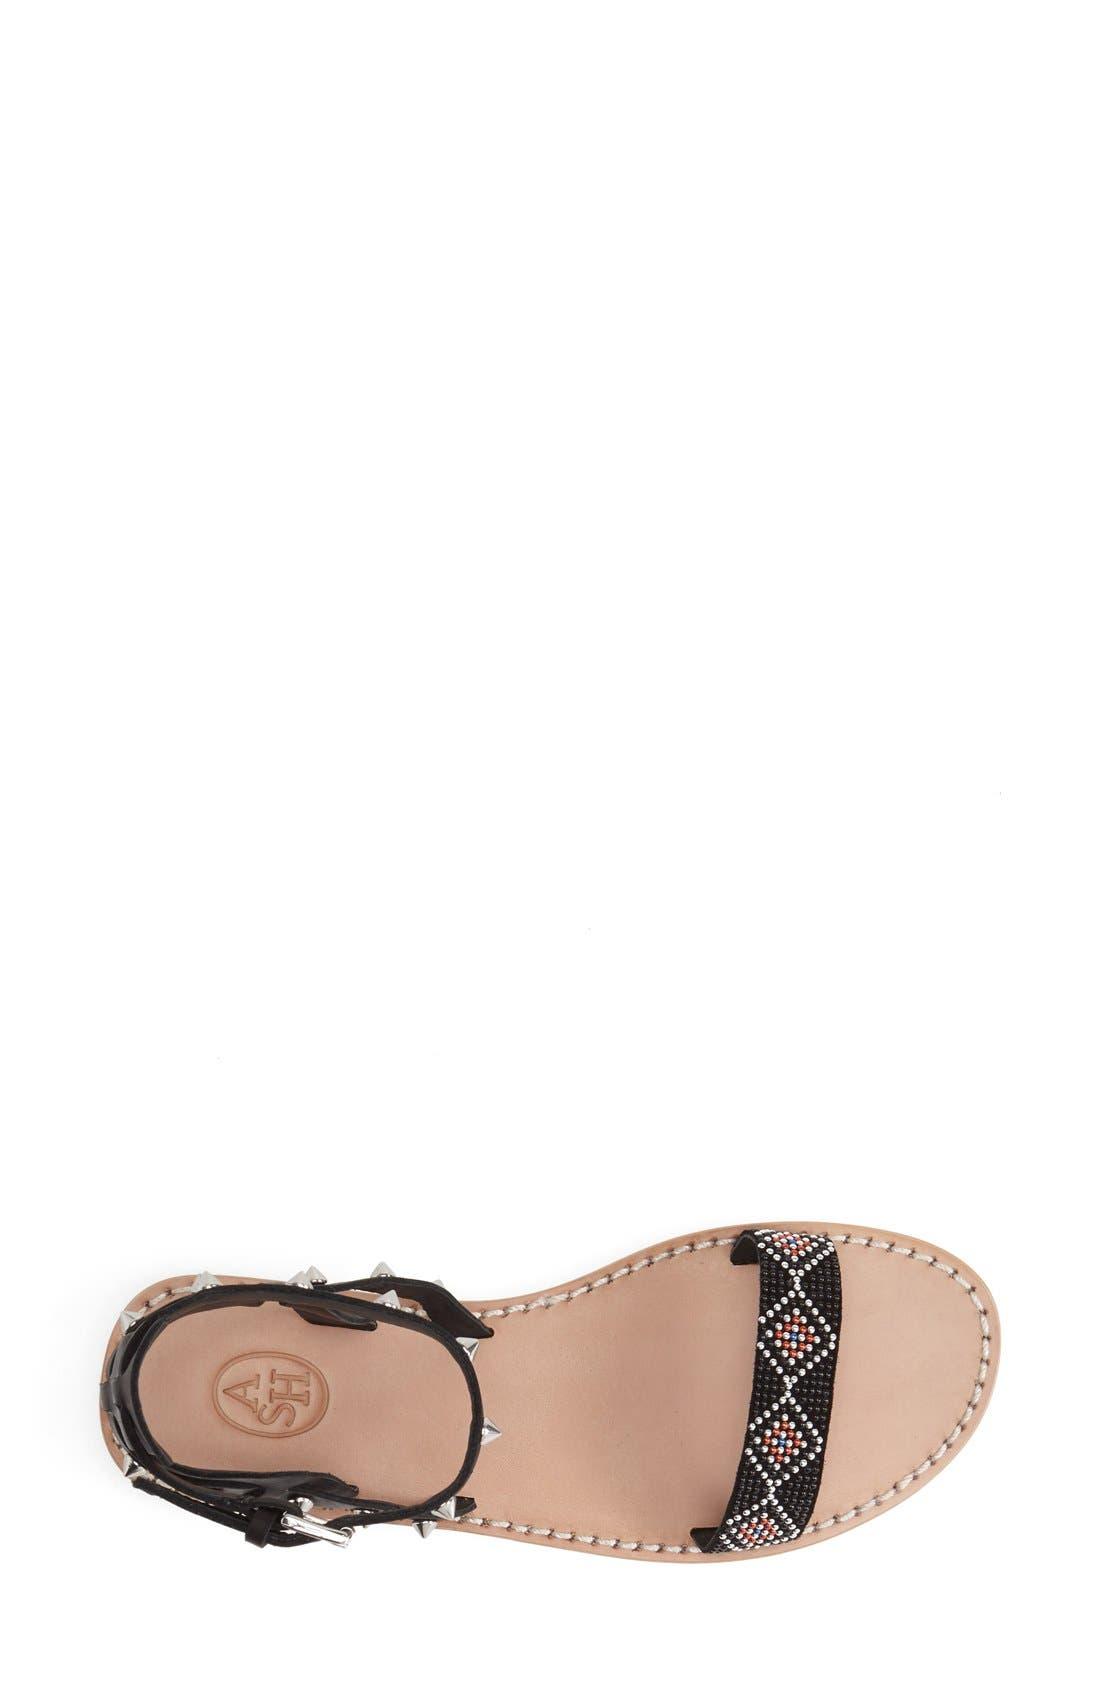 Alternate Image 3  - Ash 'Pearl' Studded Leather Sandal (Women)